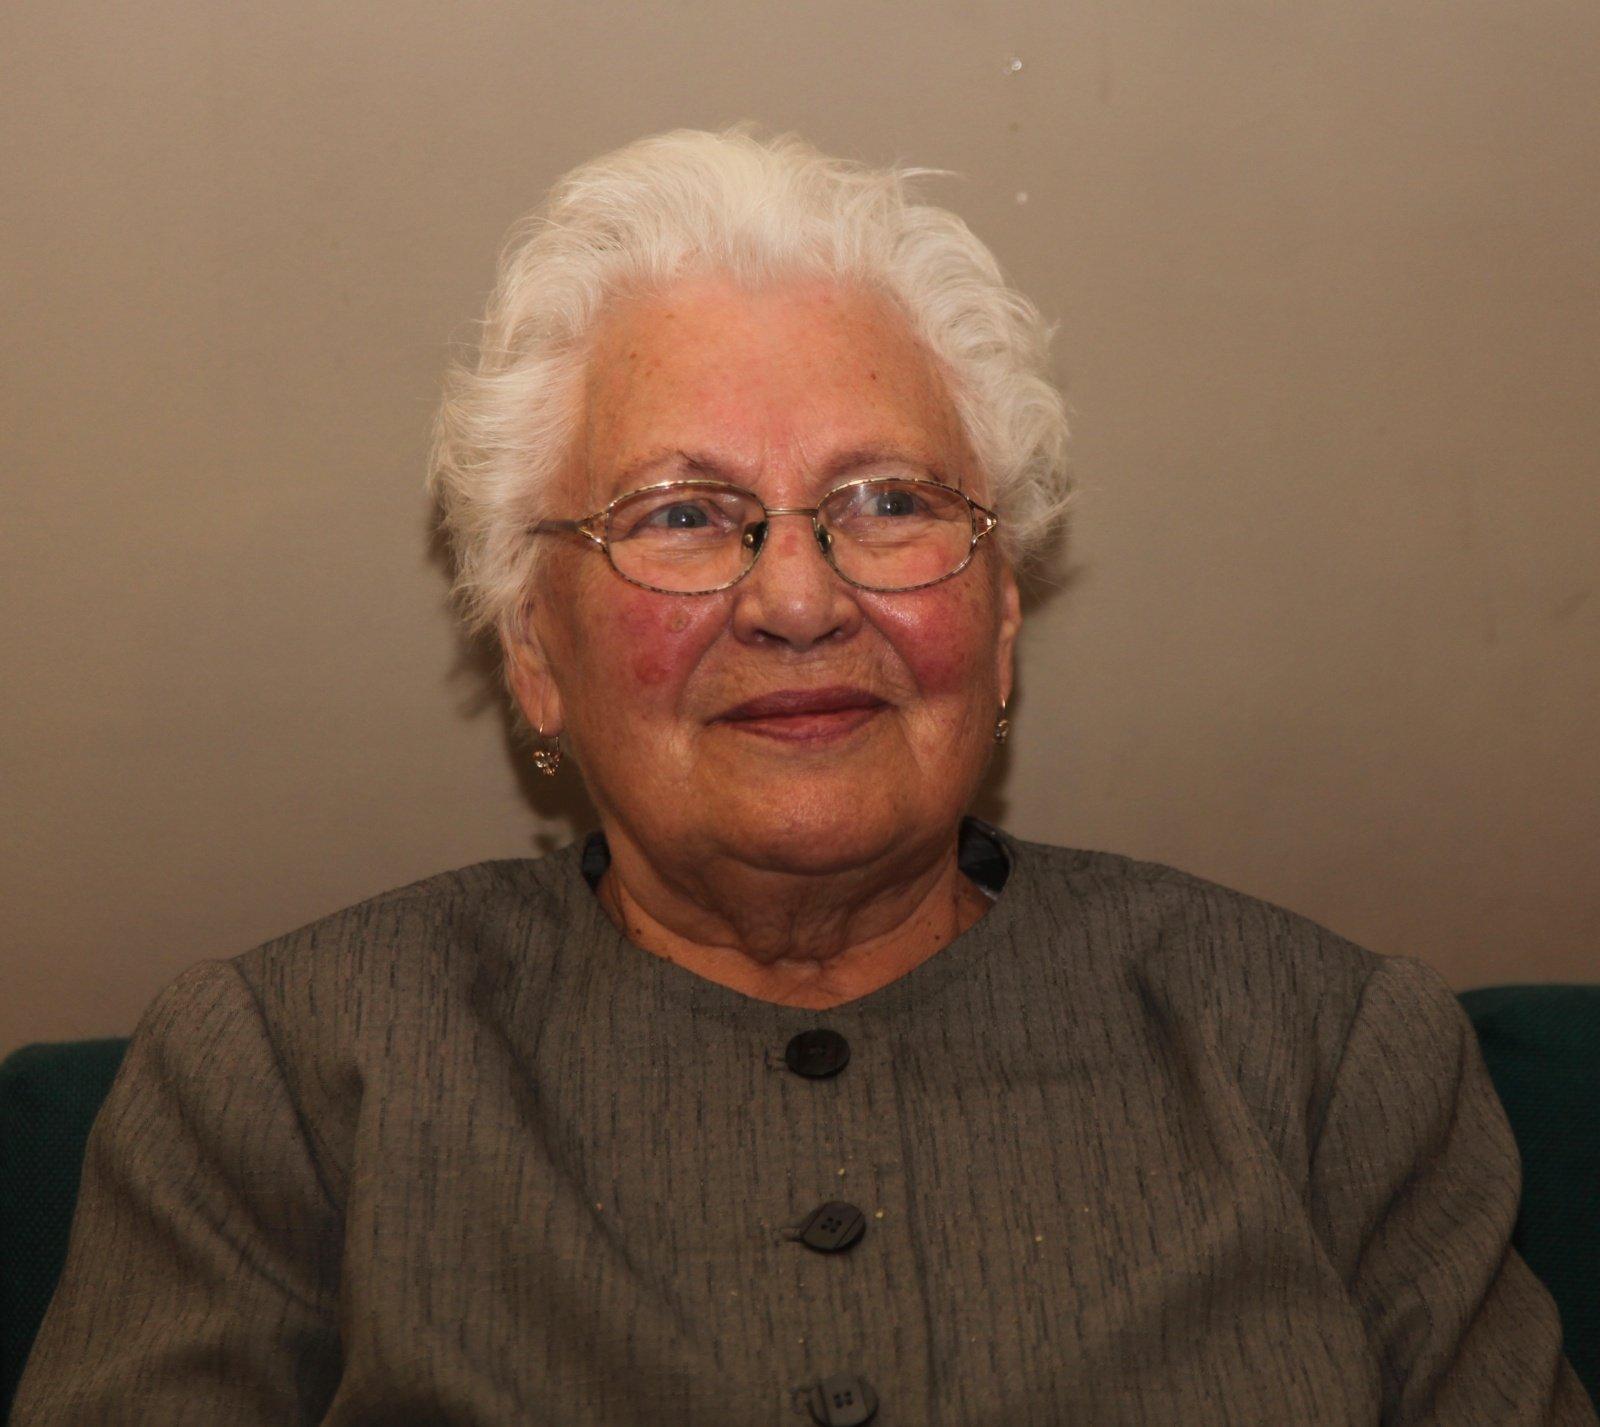 Mirė gydytoja rentgenologė Marija Dovydaitienė (Vanagaitė)